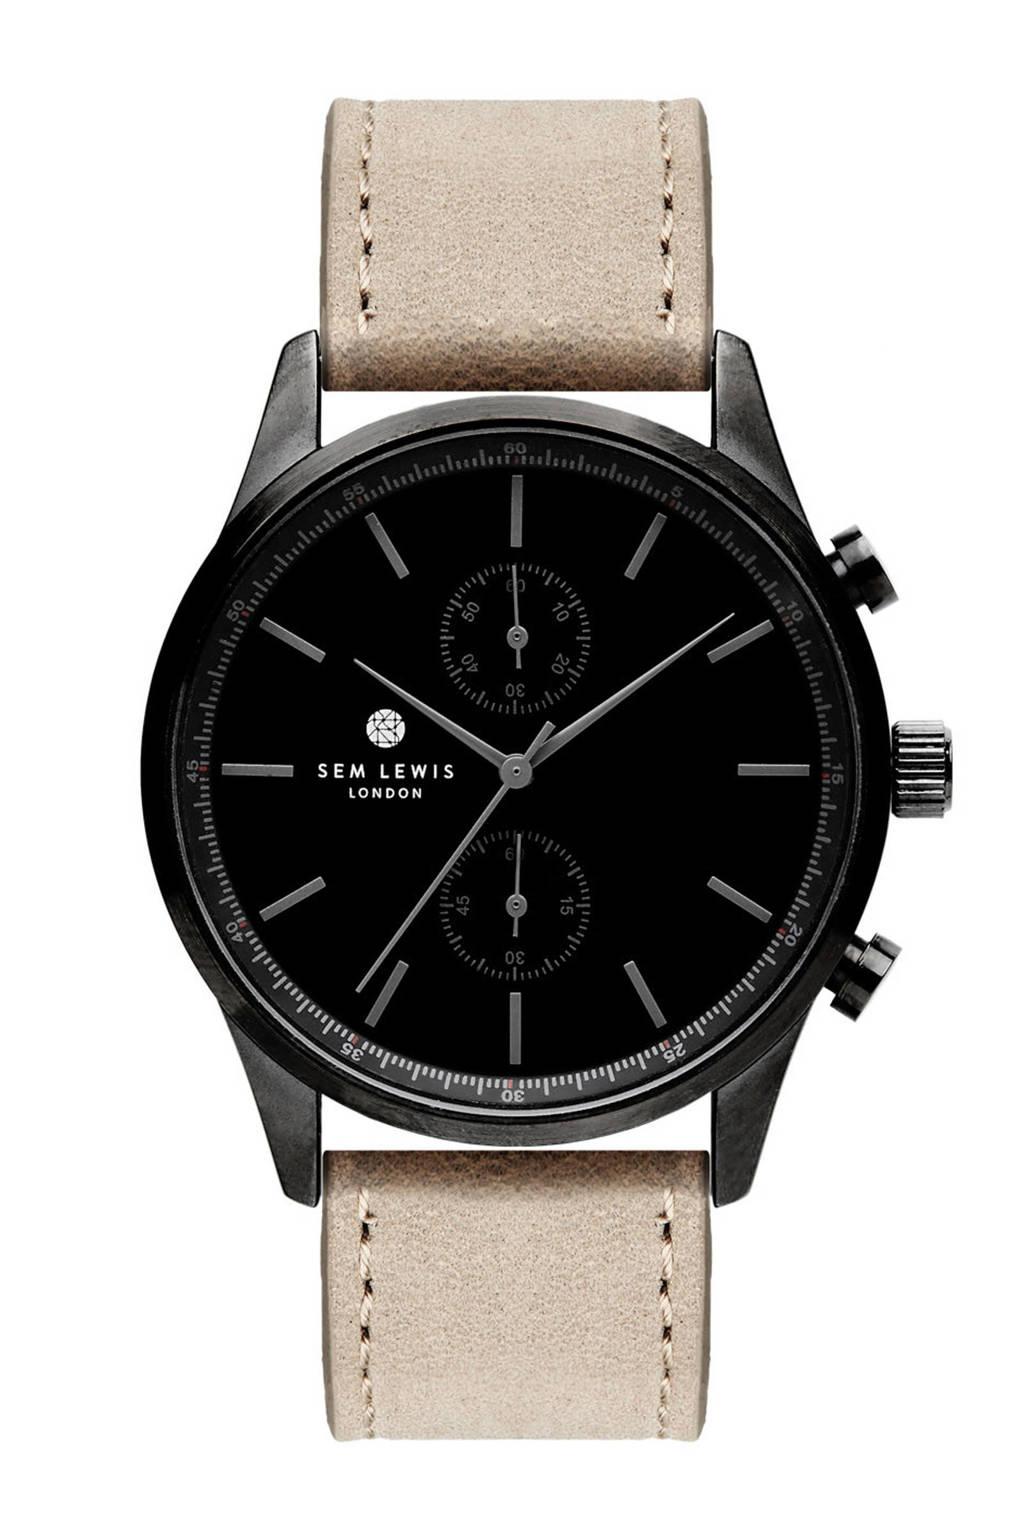 Sem Lewis horloge SL1100010, Taupe